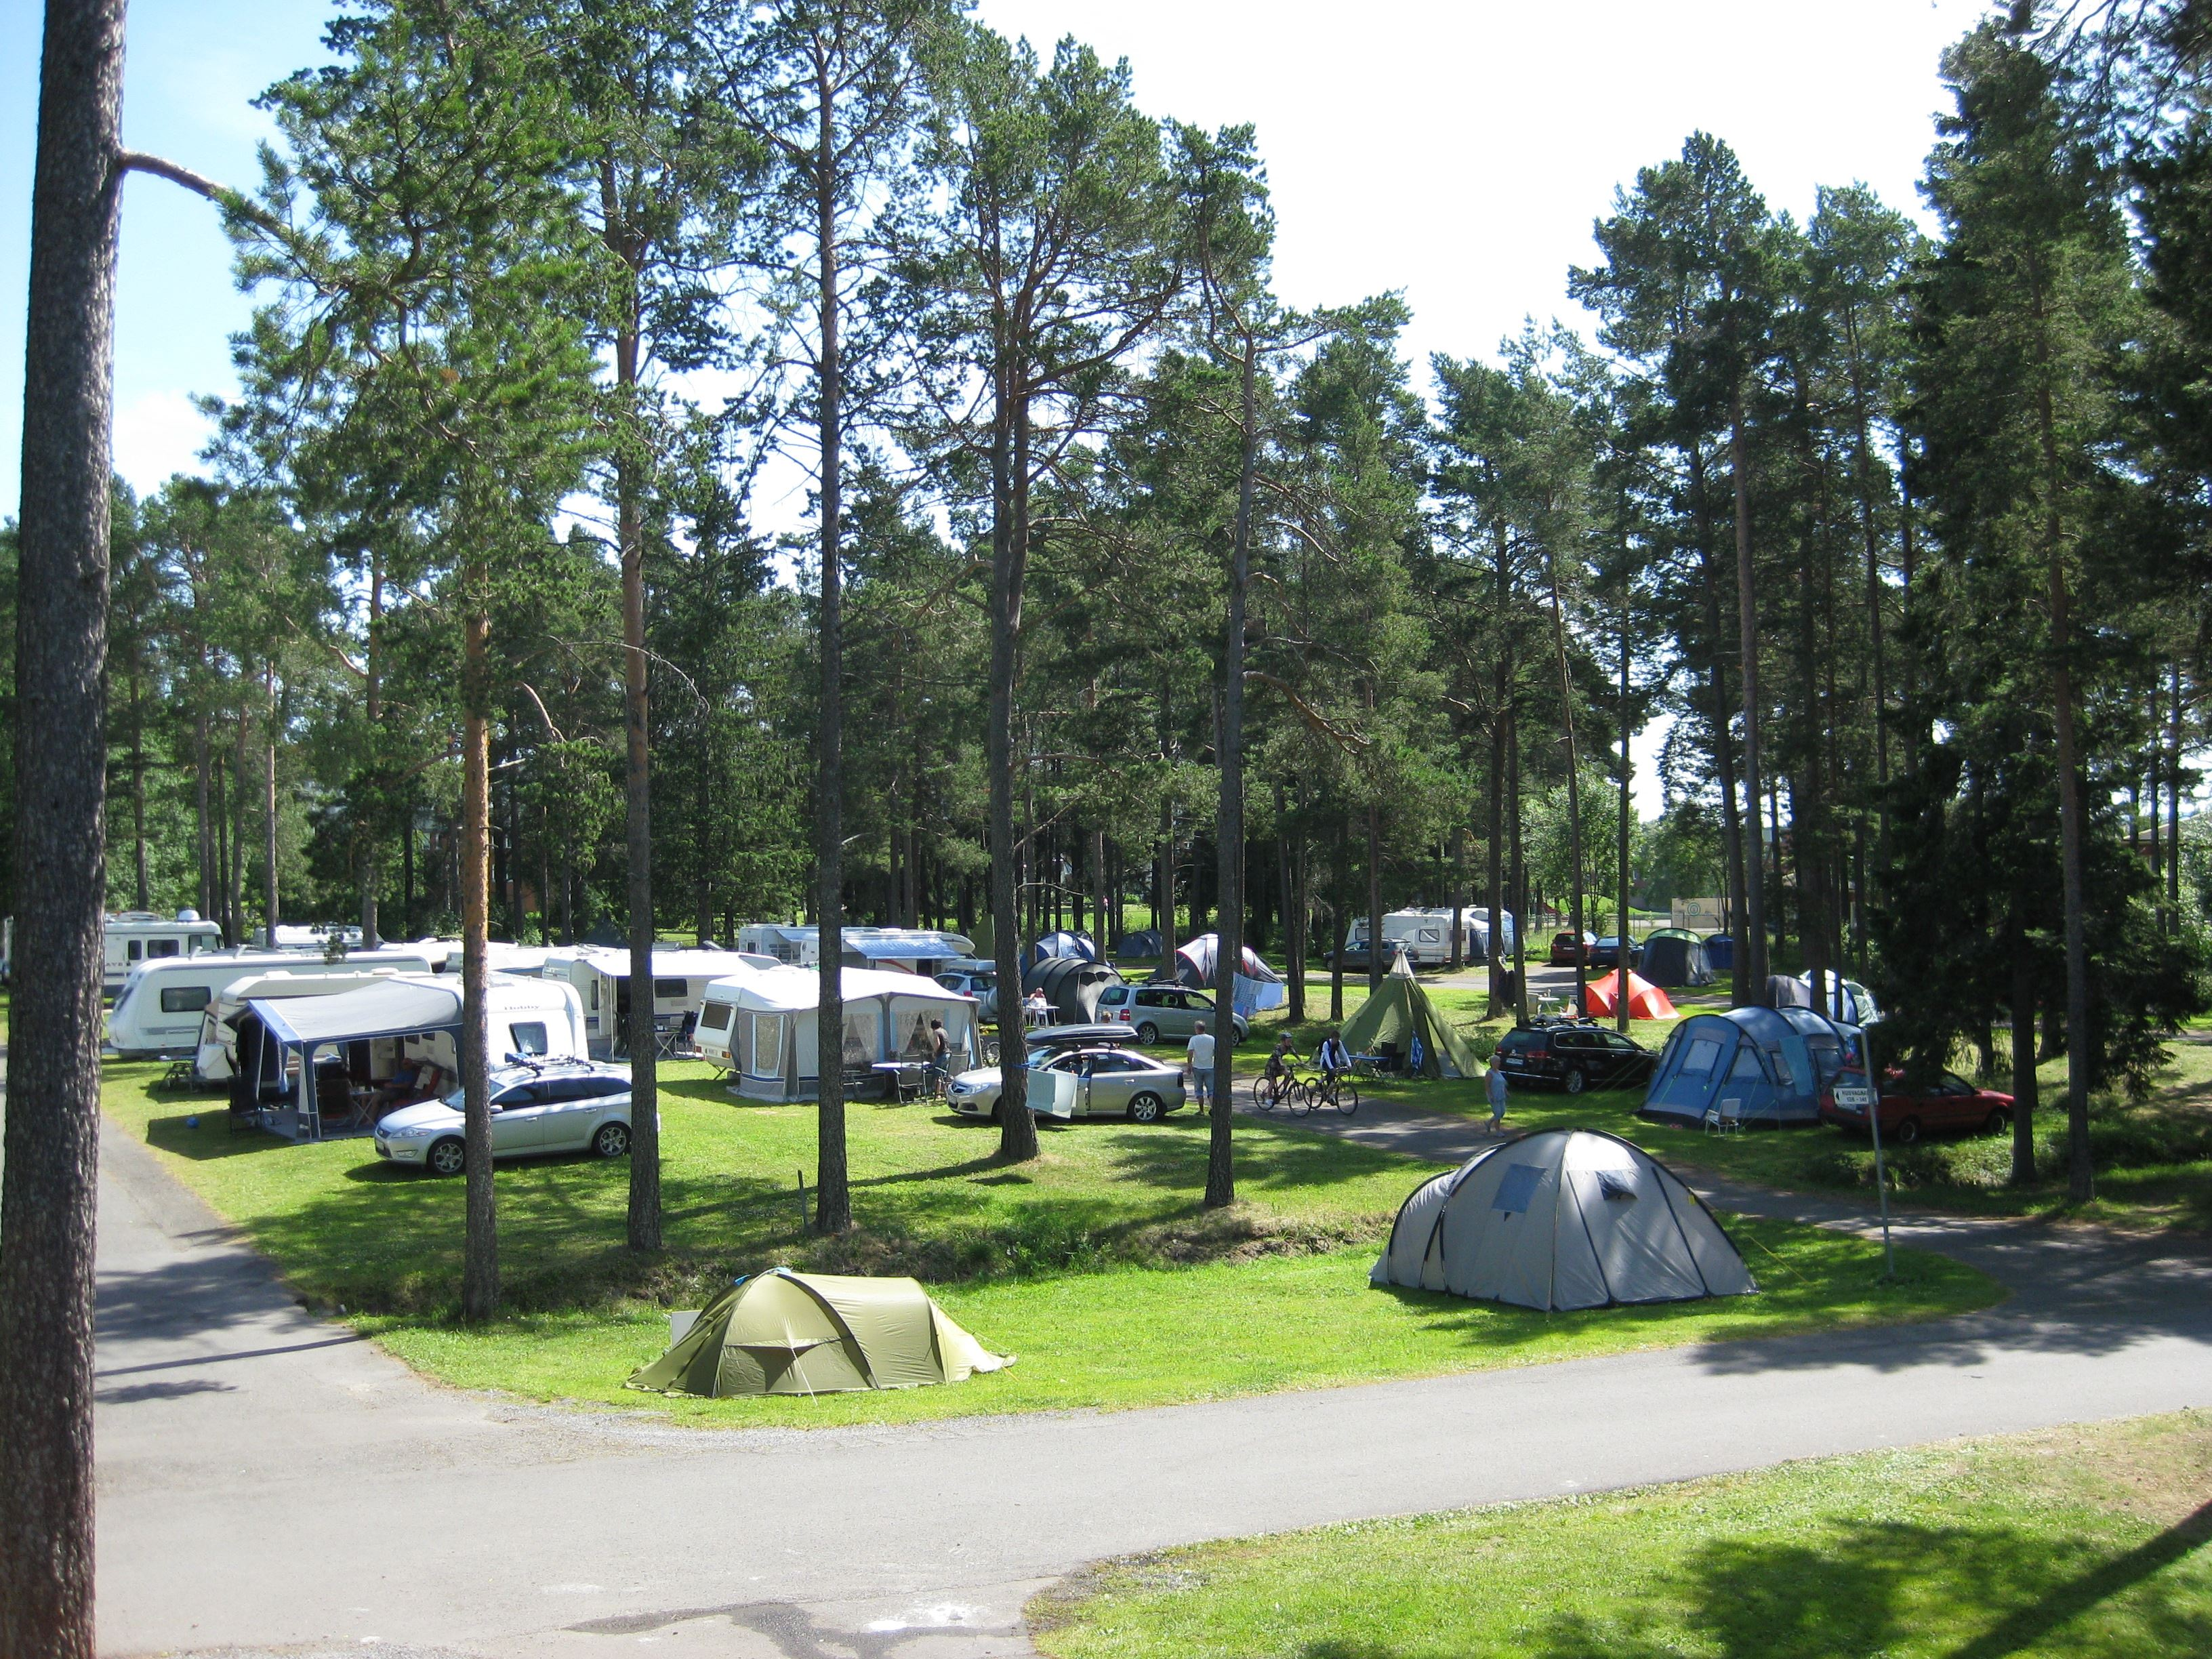 Foto: Östersunds Stugby & Camping,  © Copy: Östersunds Stugby & Camping, Husbilar, husvagnar och tält